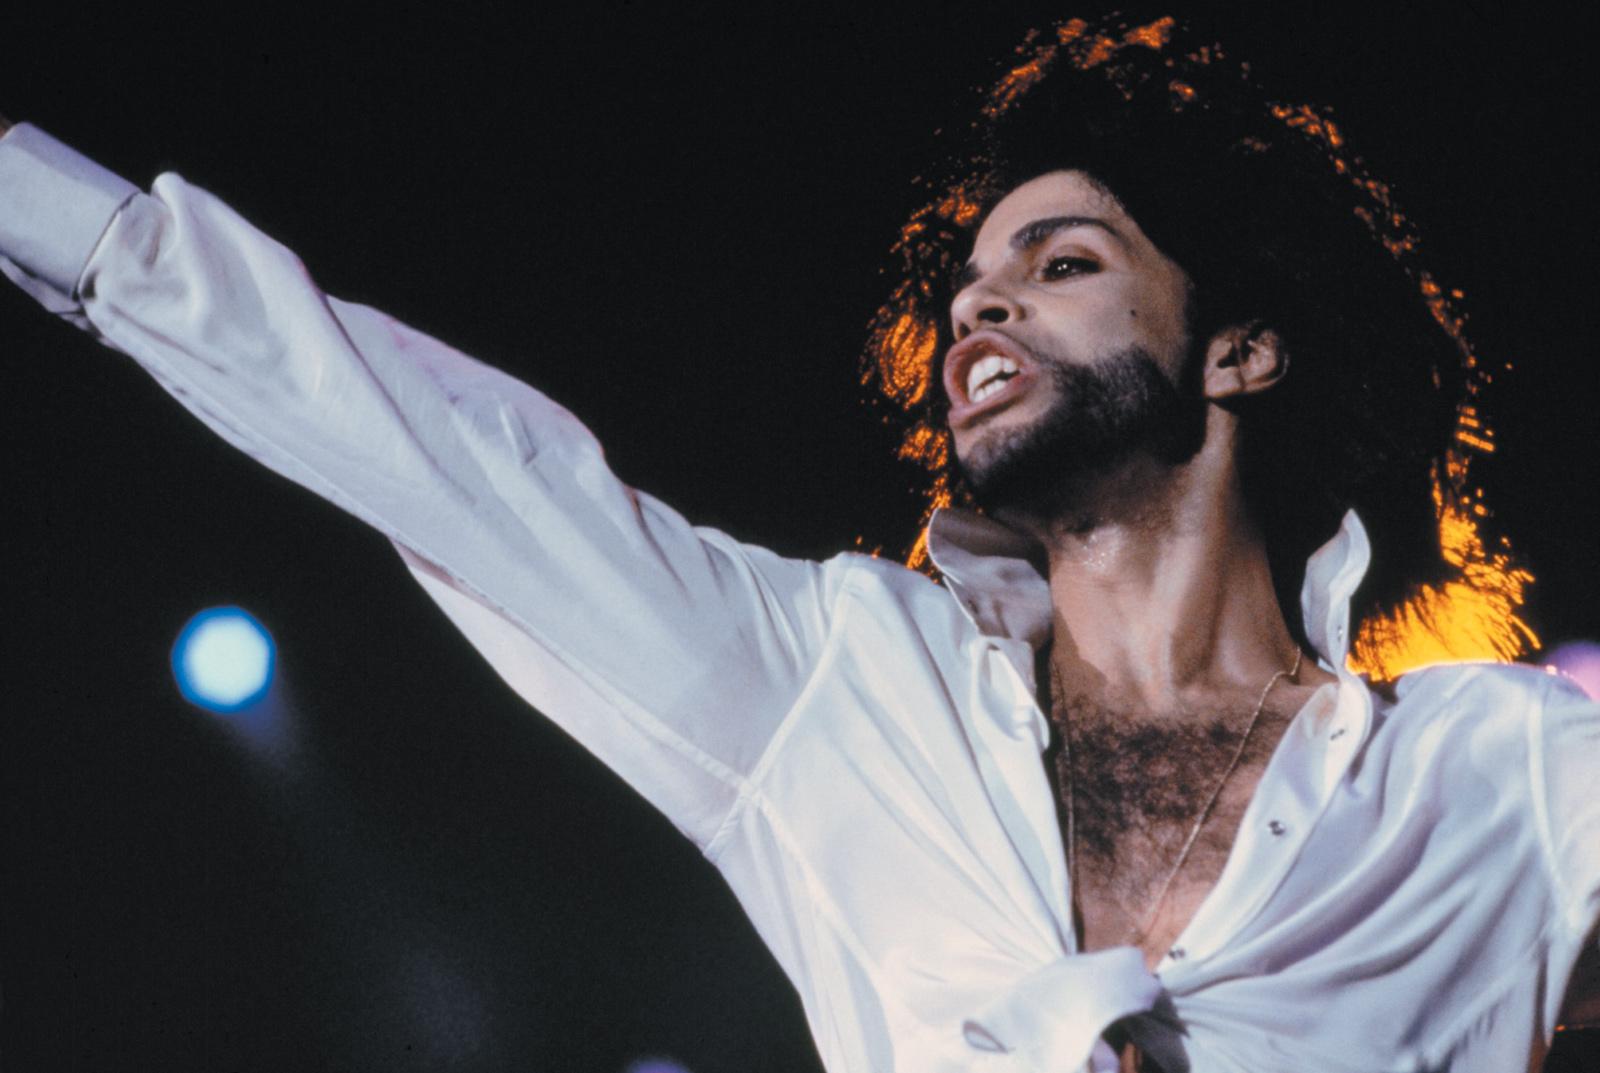 Prince performing at a music festival in Rio de Janeiro, 1991